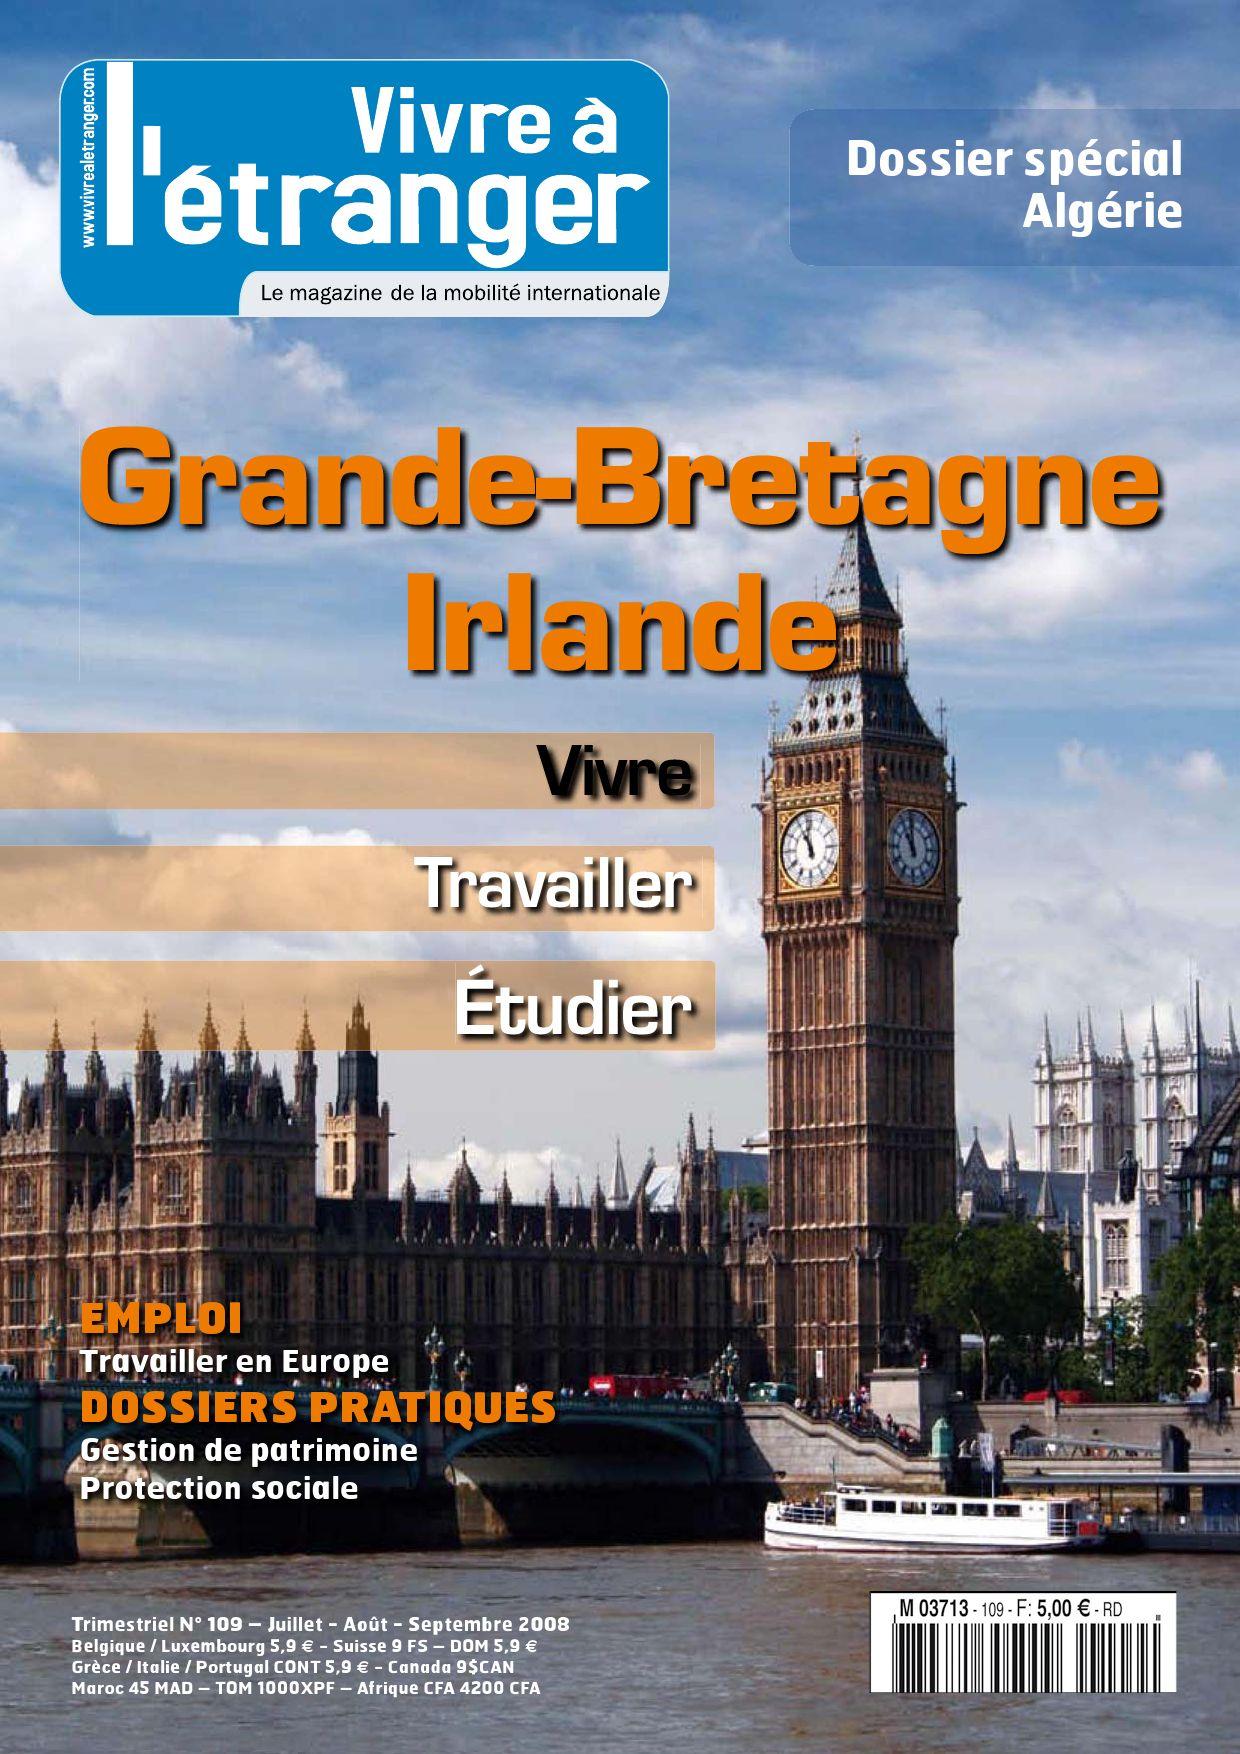 Grande bretagne irlande vivre travailler tudier by for Chambre de commerce francaise en grande bretagne